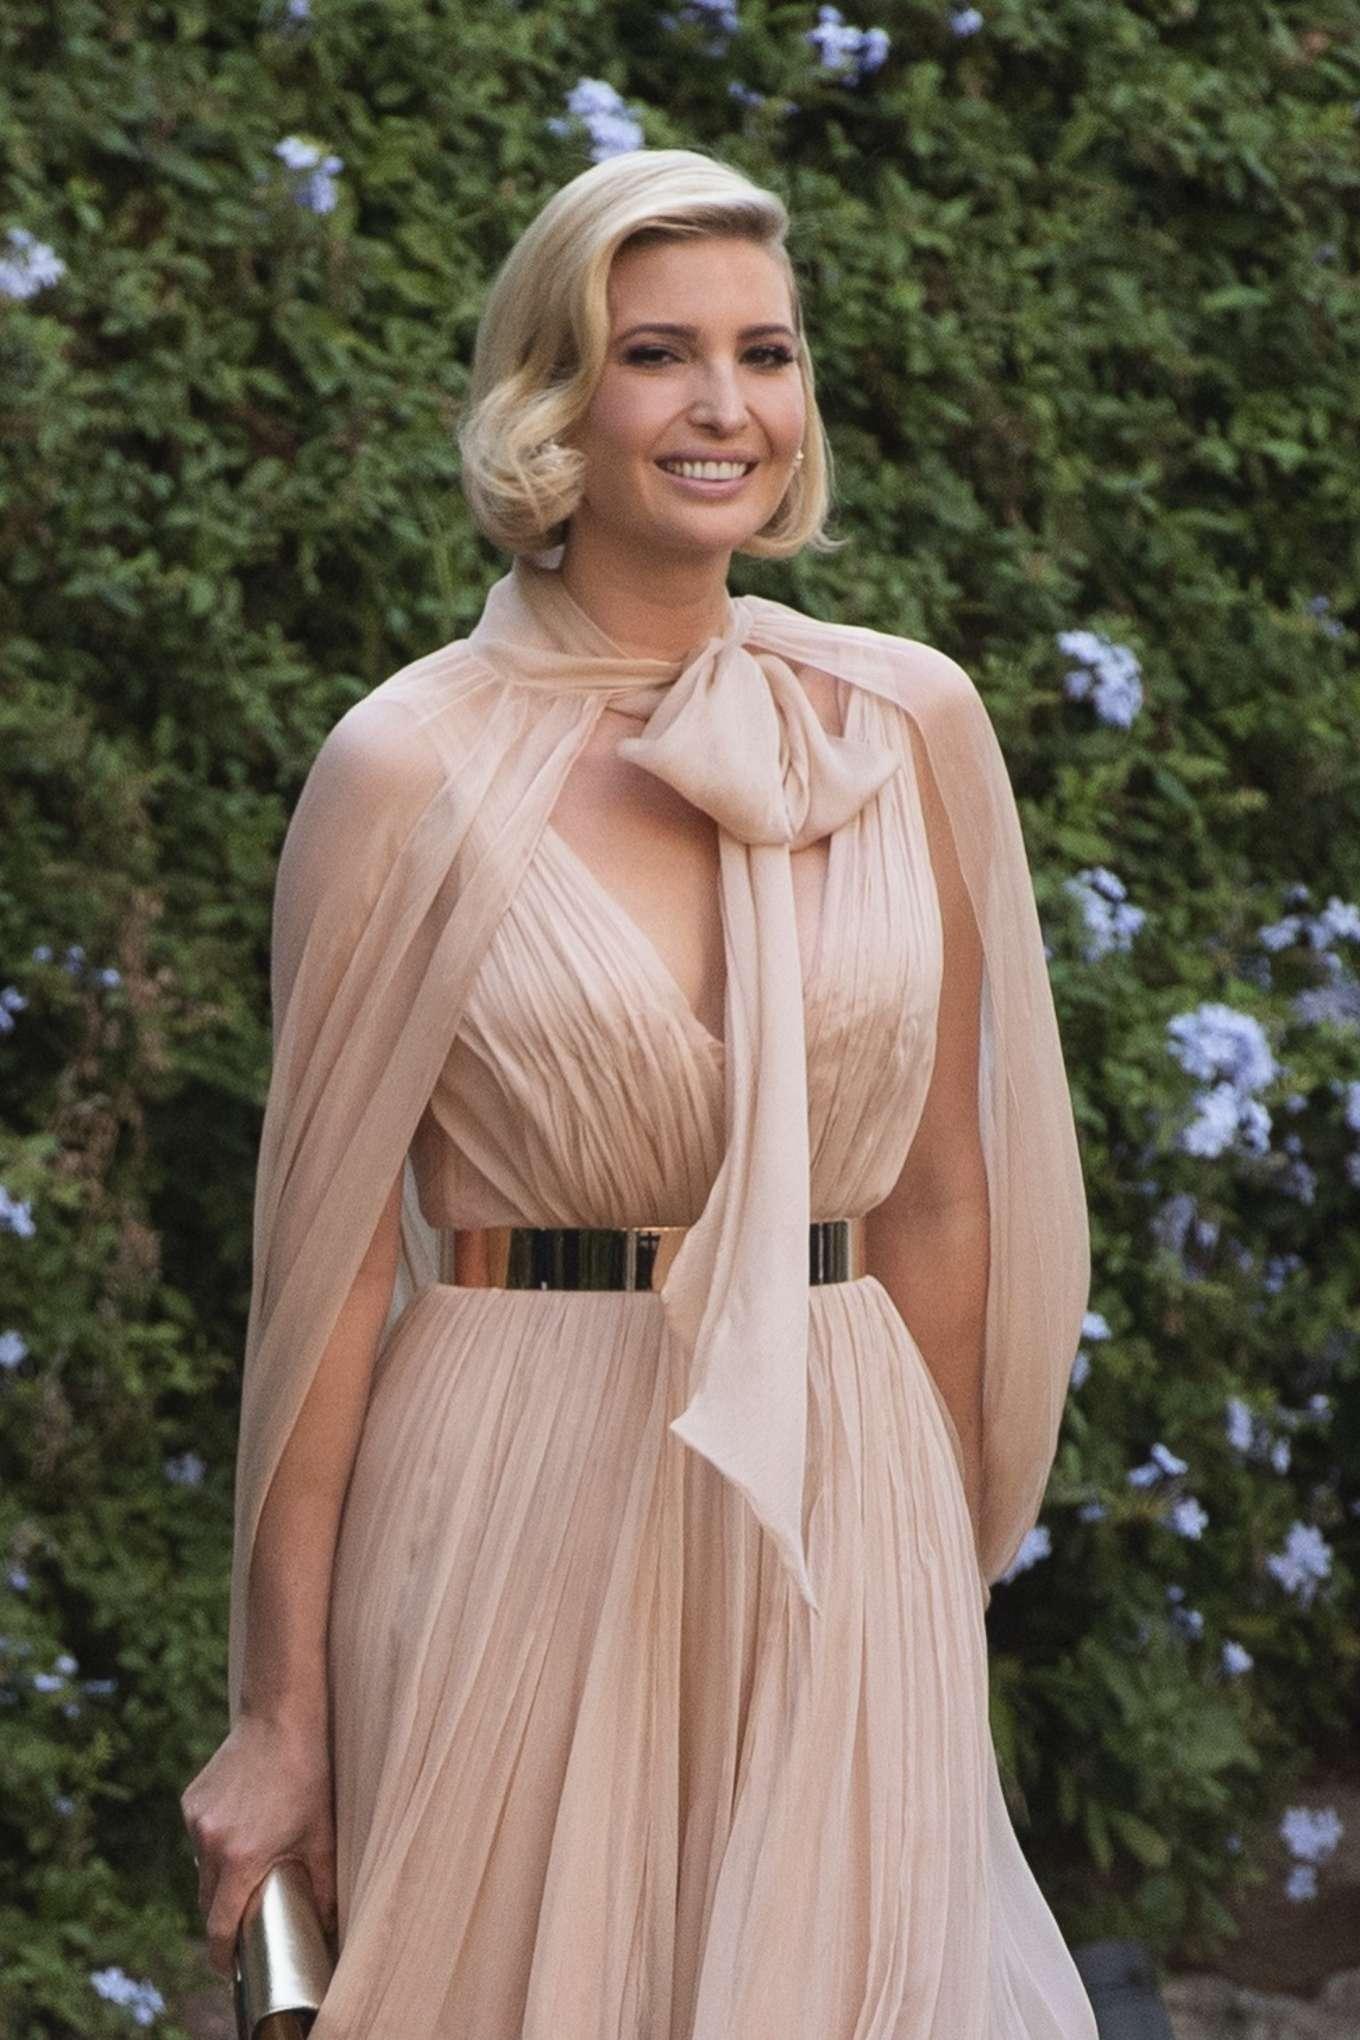 Ivanka Trump - Attend Misha Nonoo's wedding in Rome